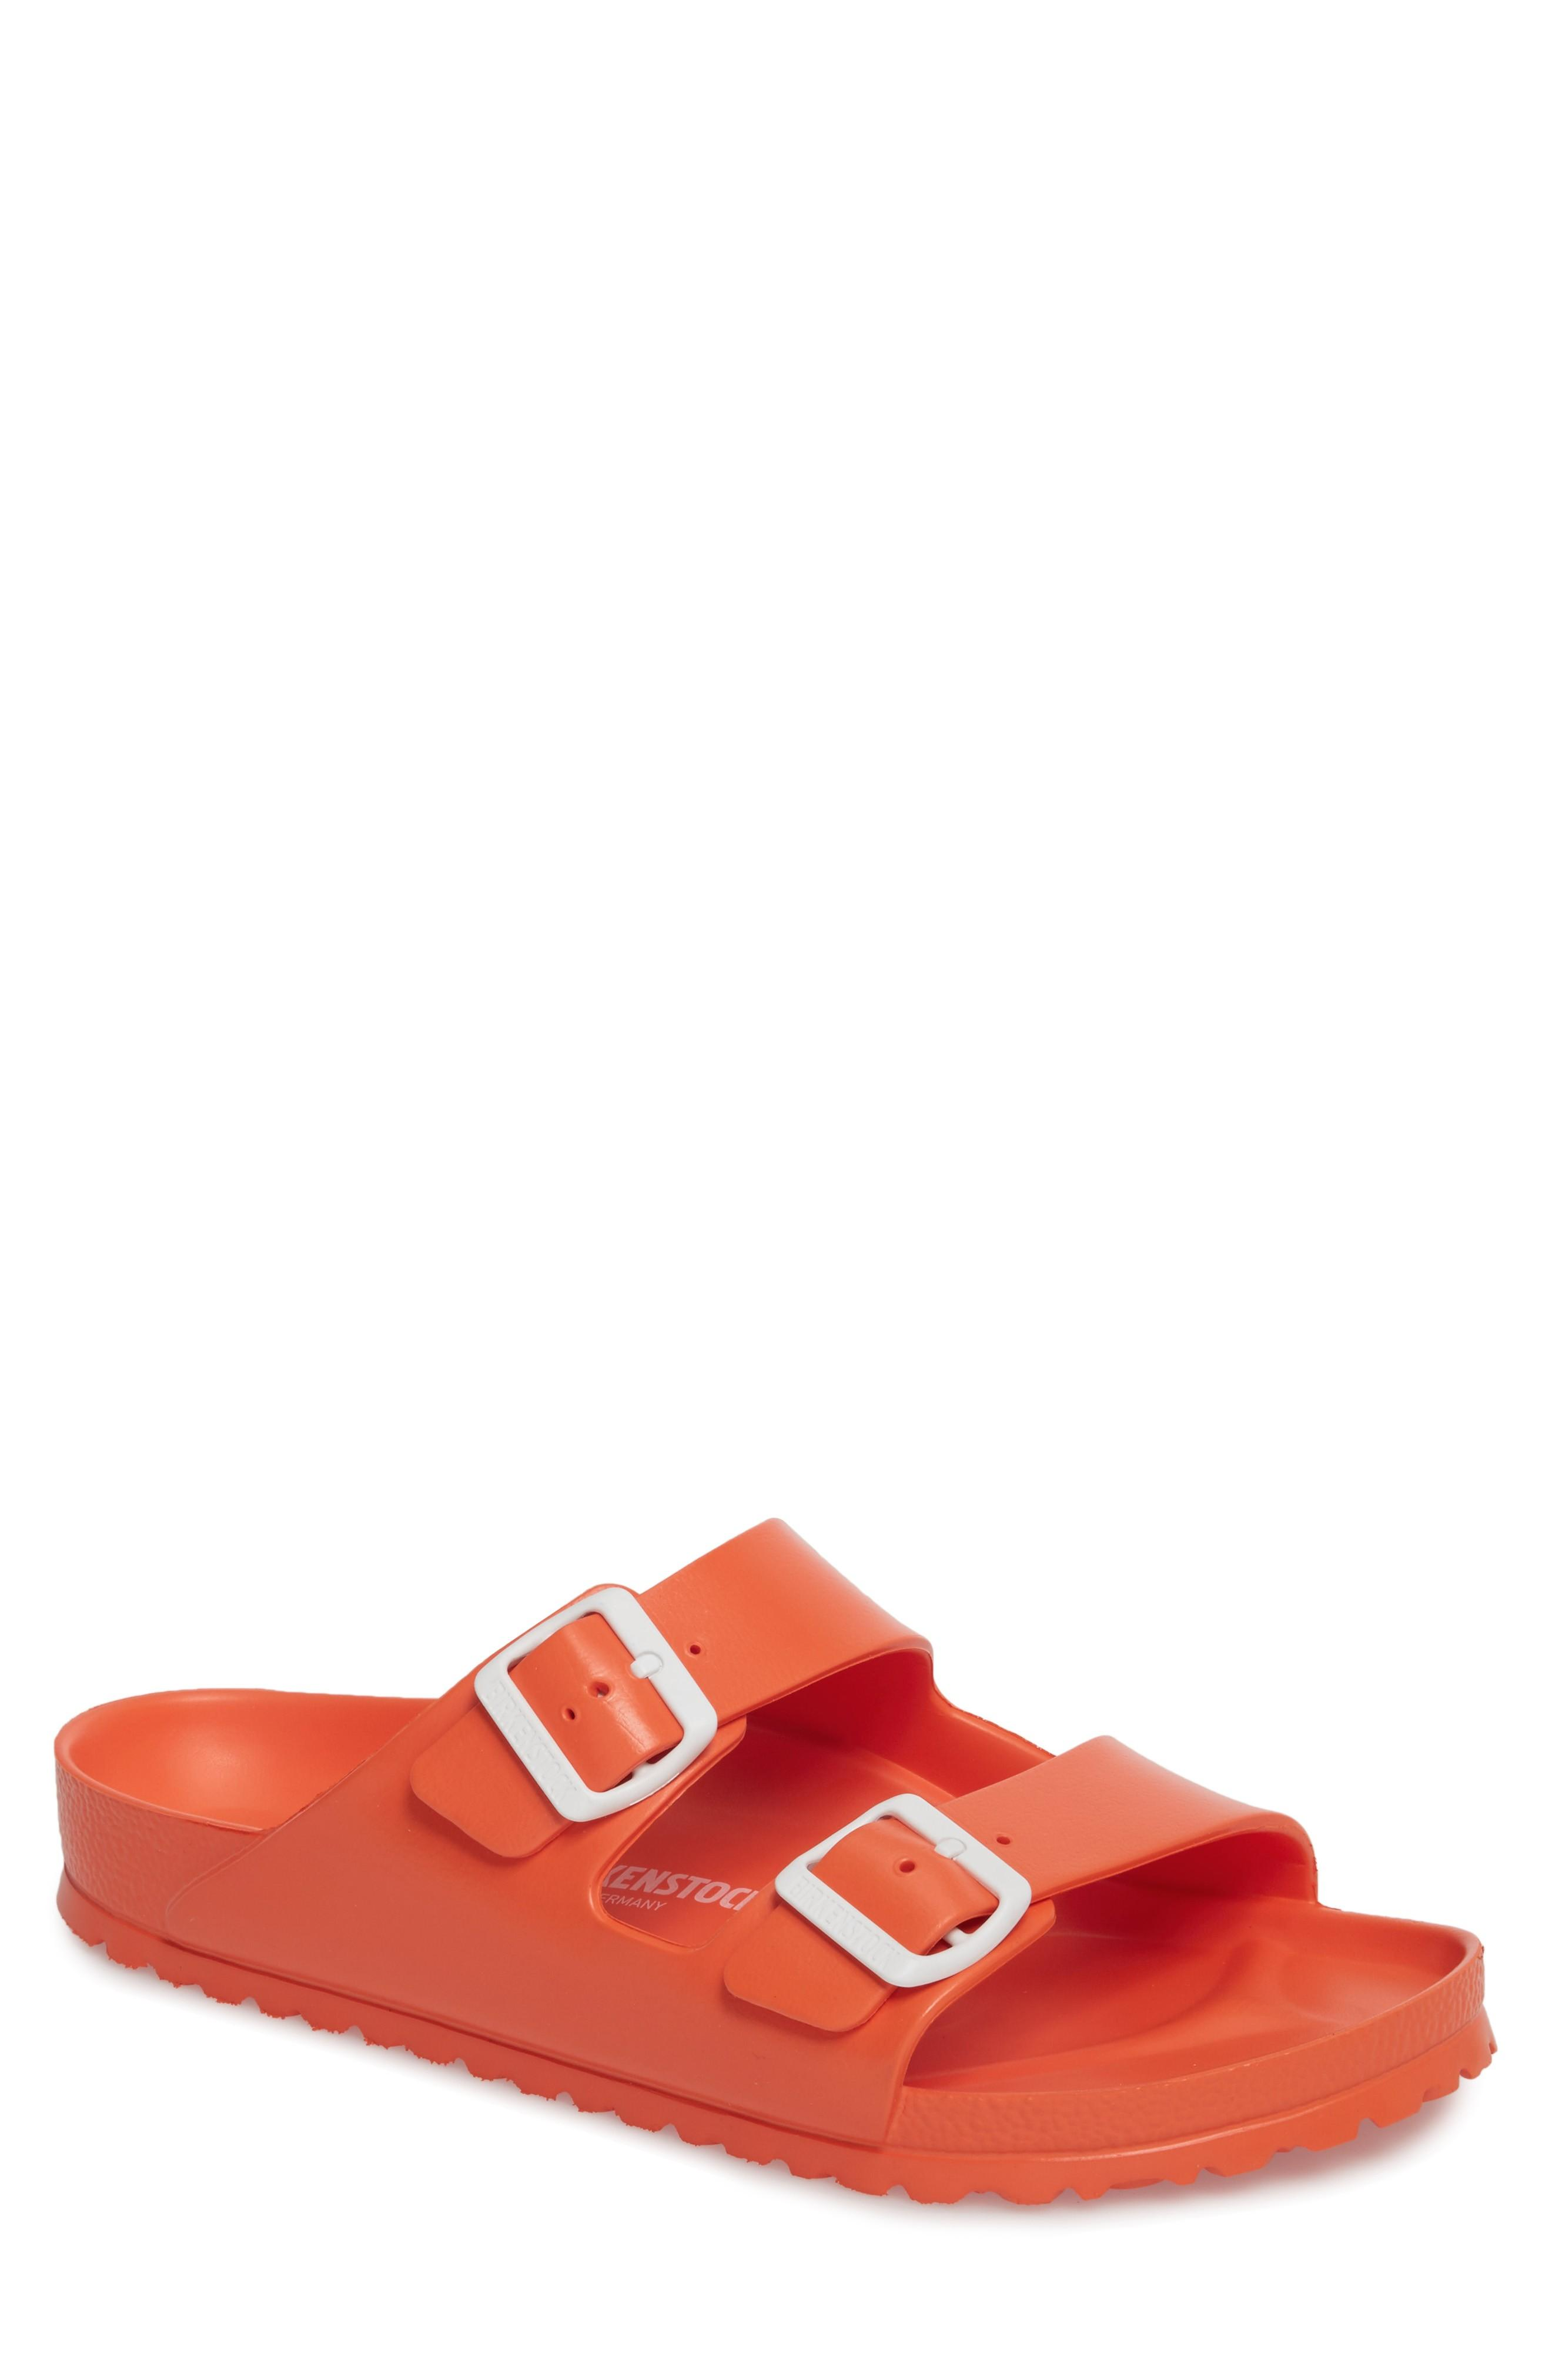 8ef7d3a5362fe9 Birkenstock Essentials Arizona Eva Waterproof Slide Sandal In Coral ...